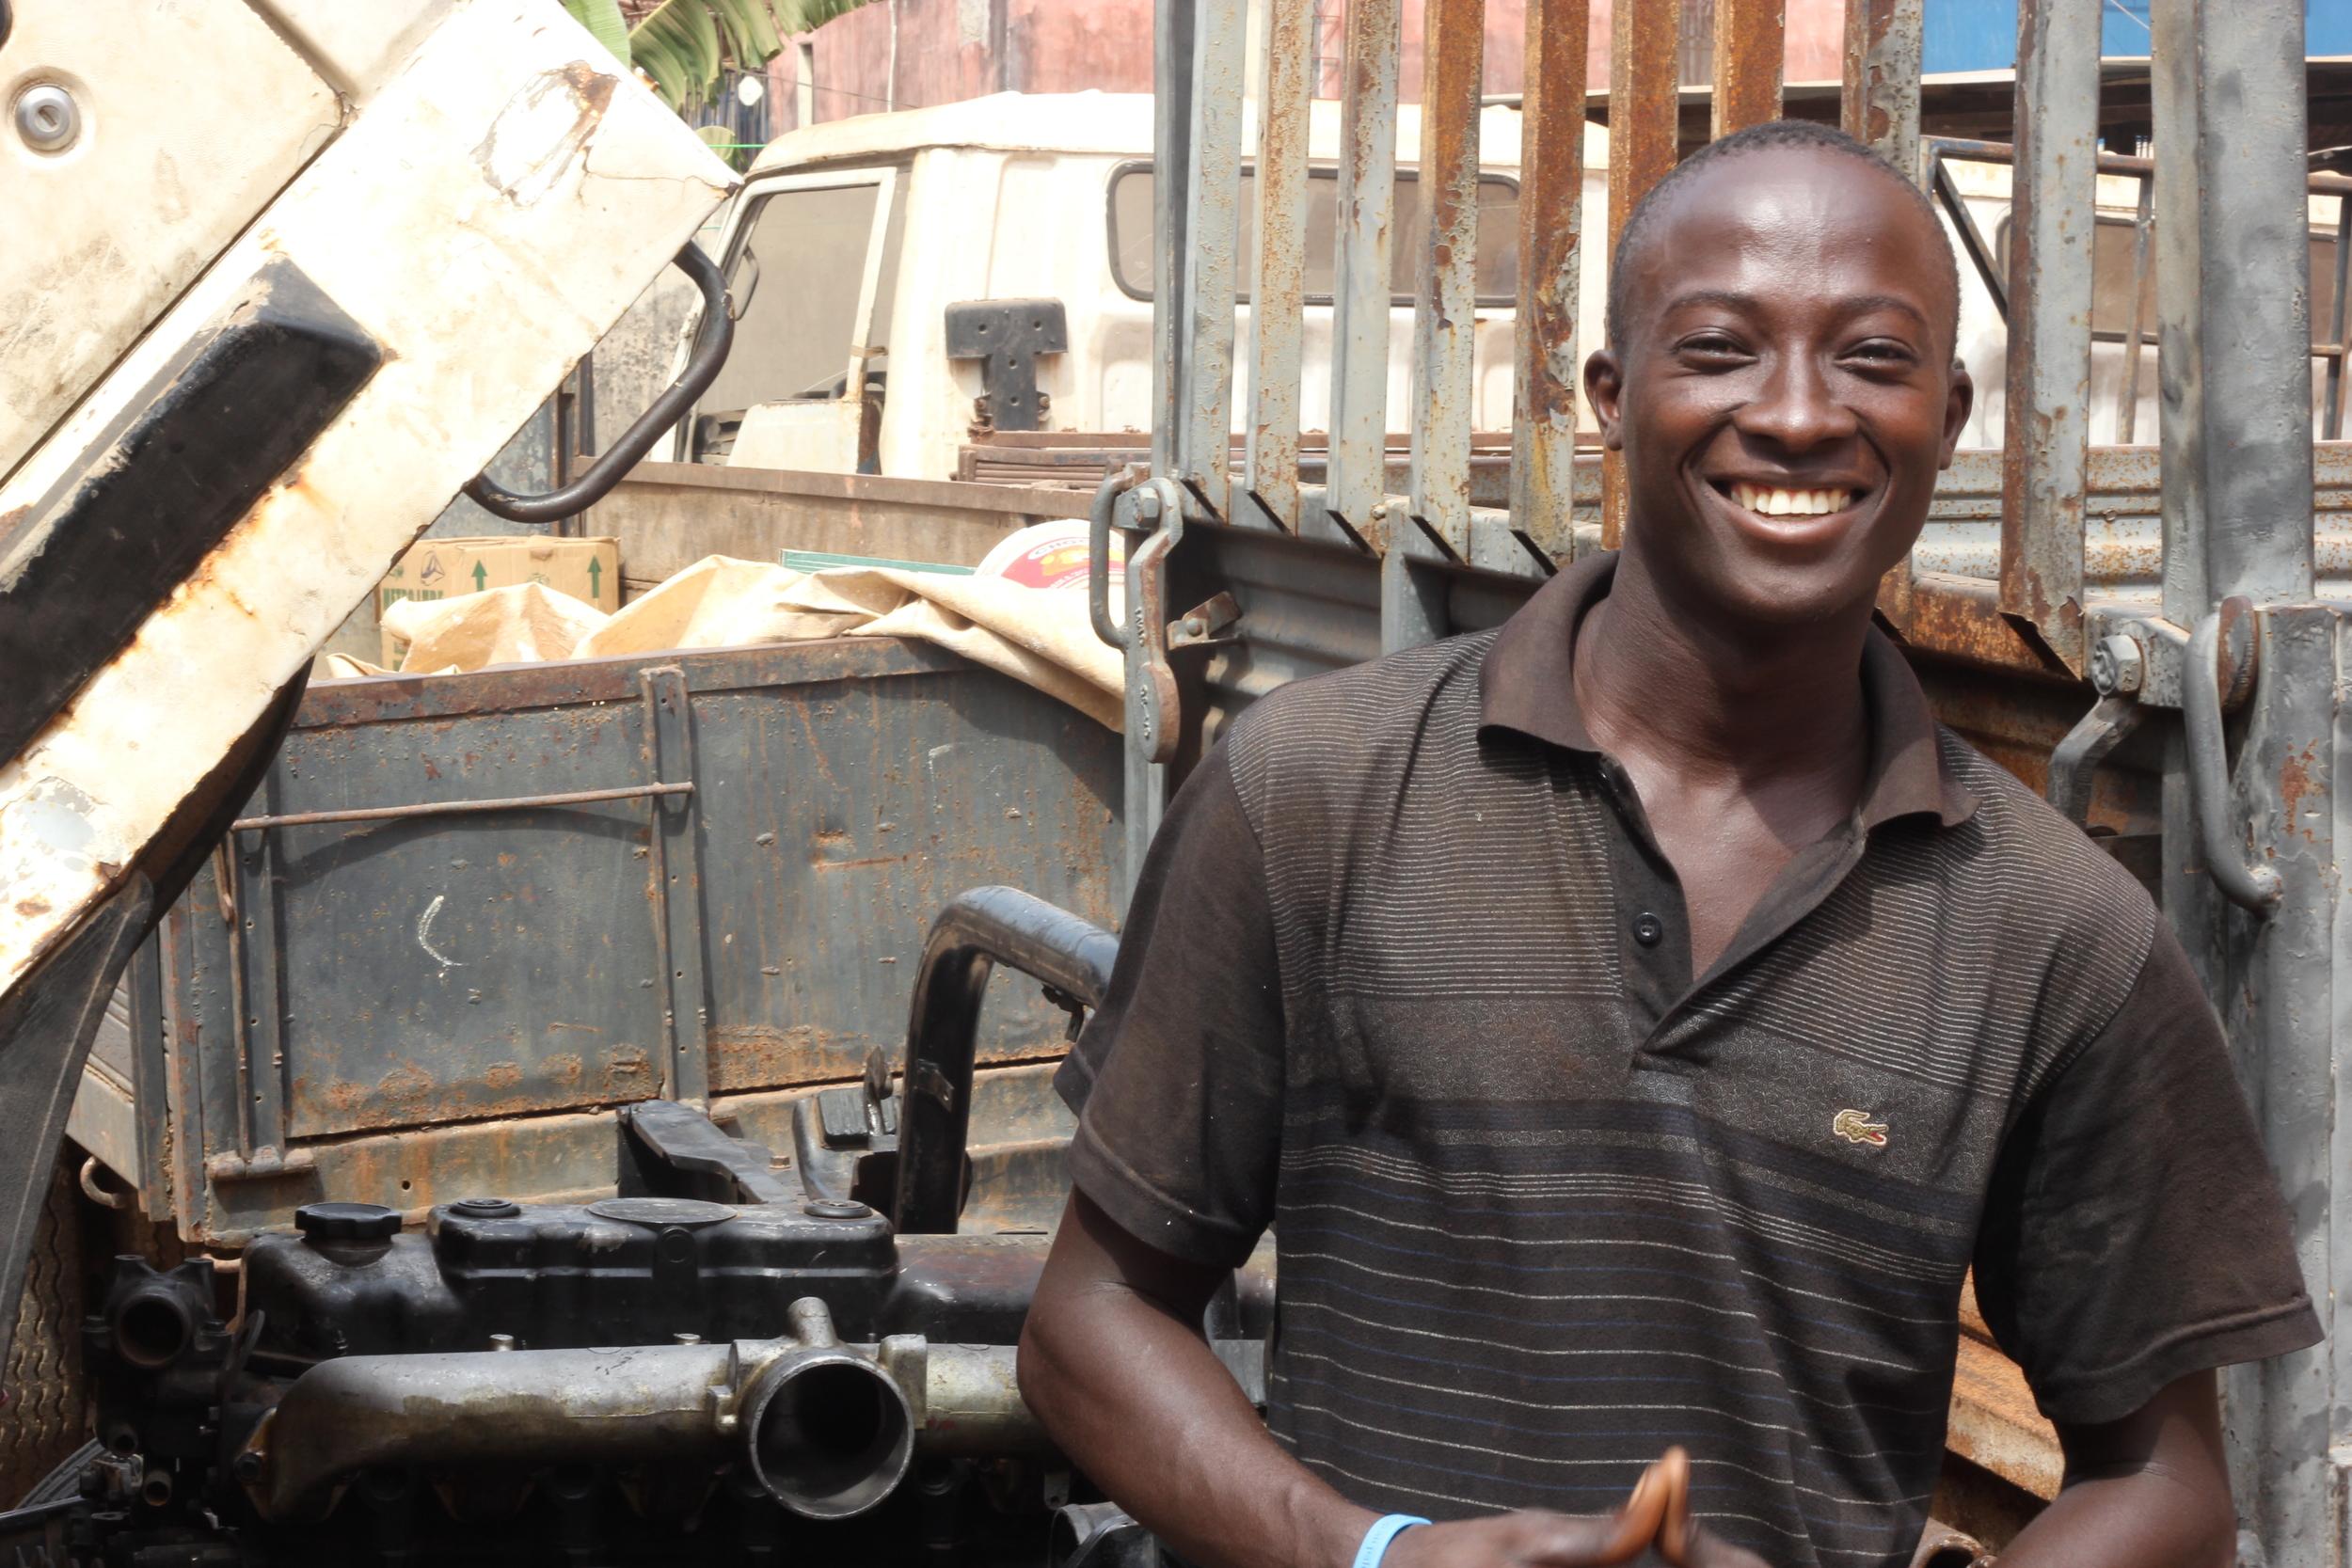 West African Vocational Schools Auto Mechanics student